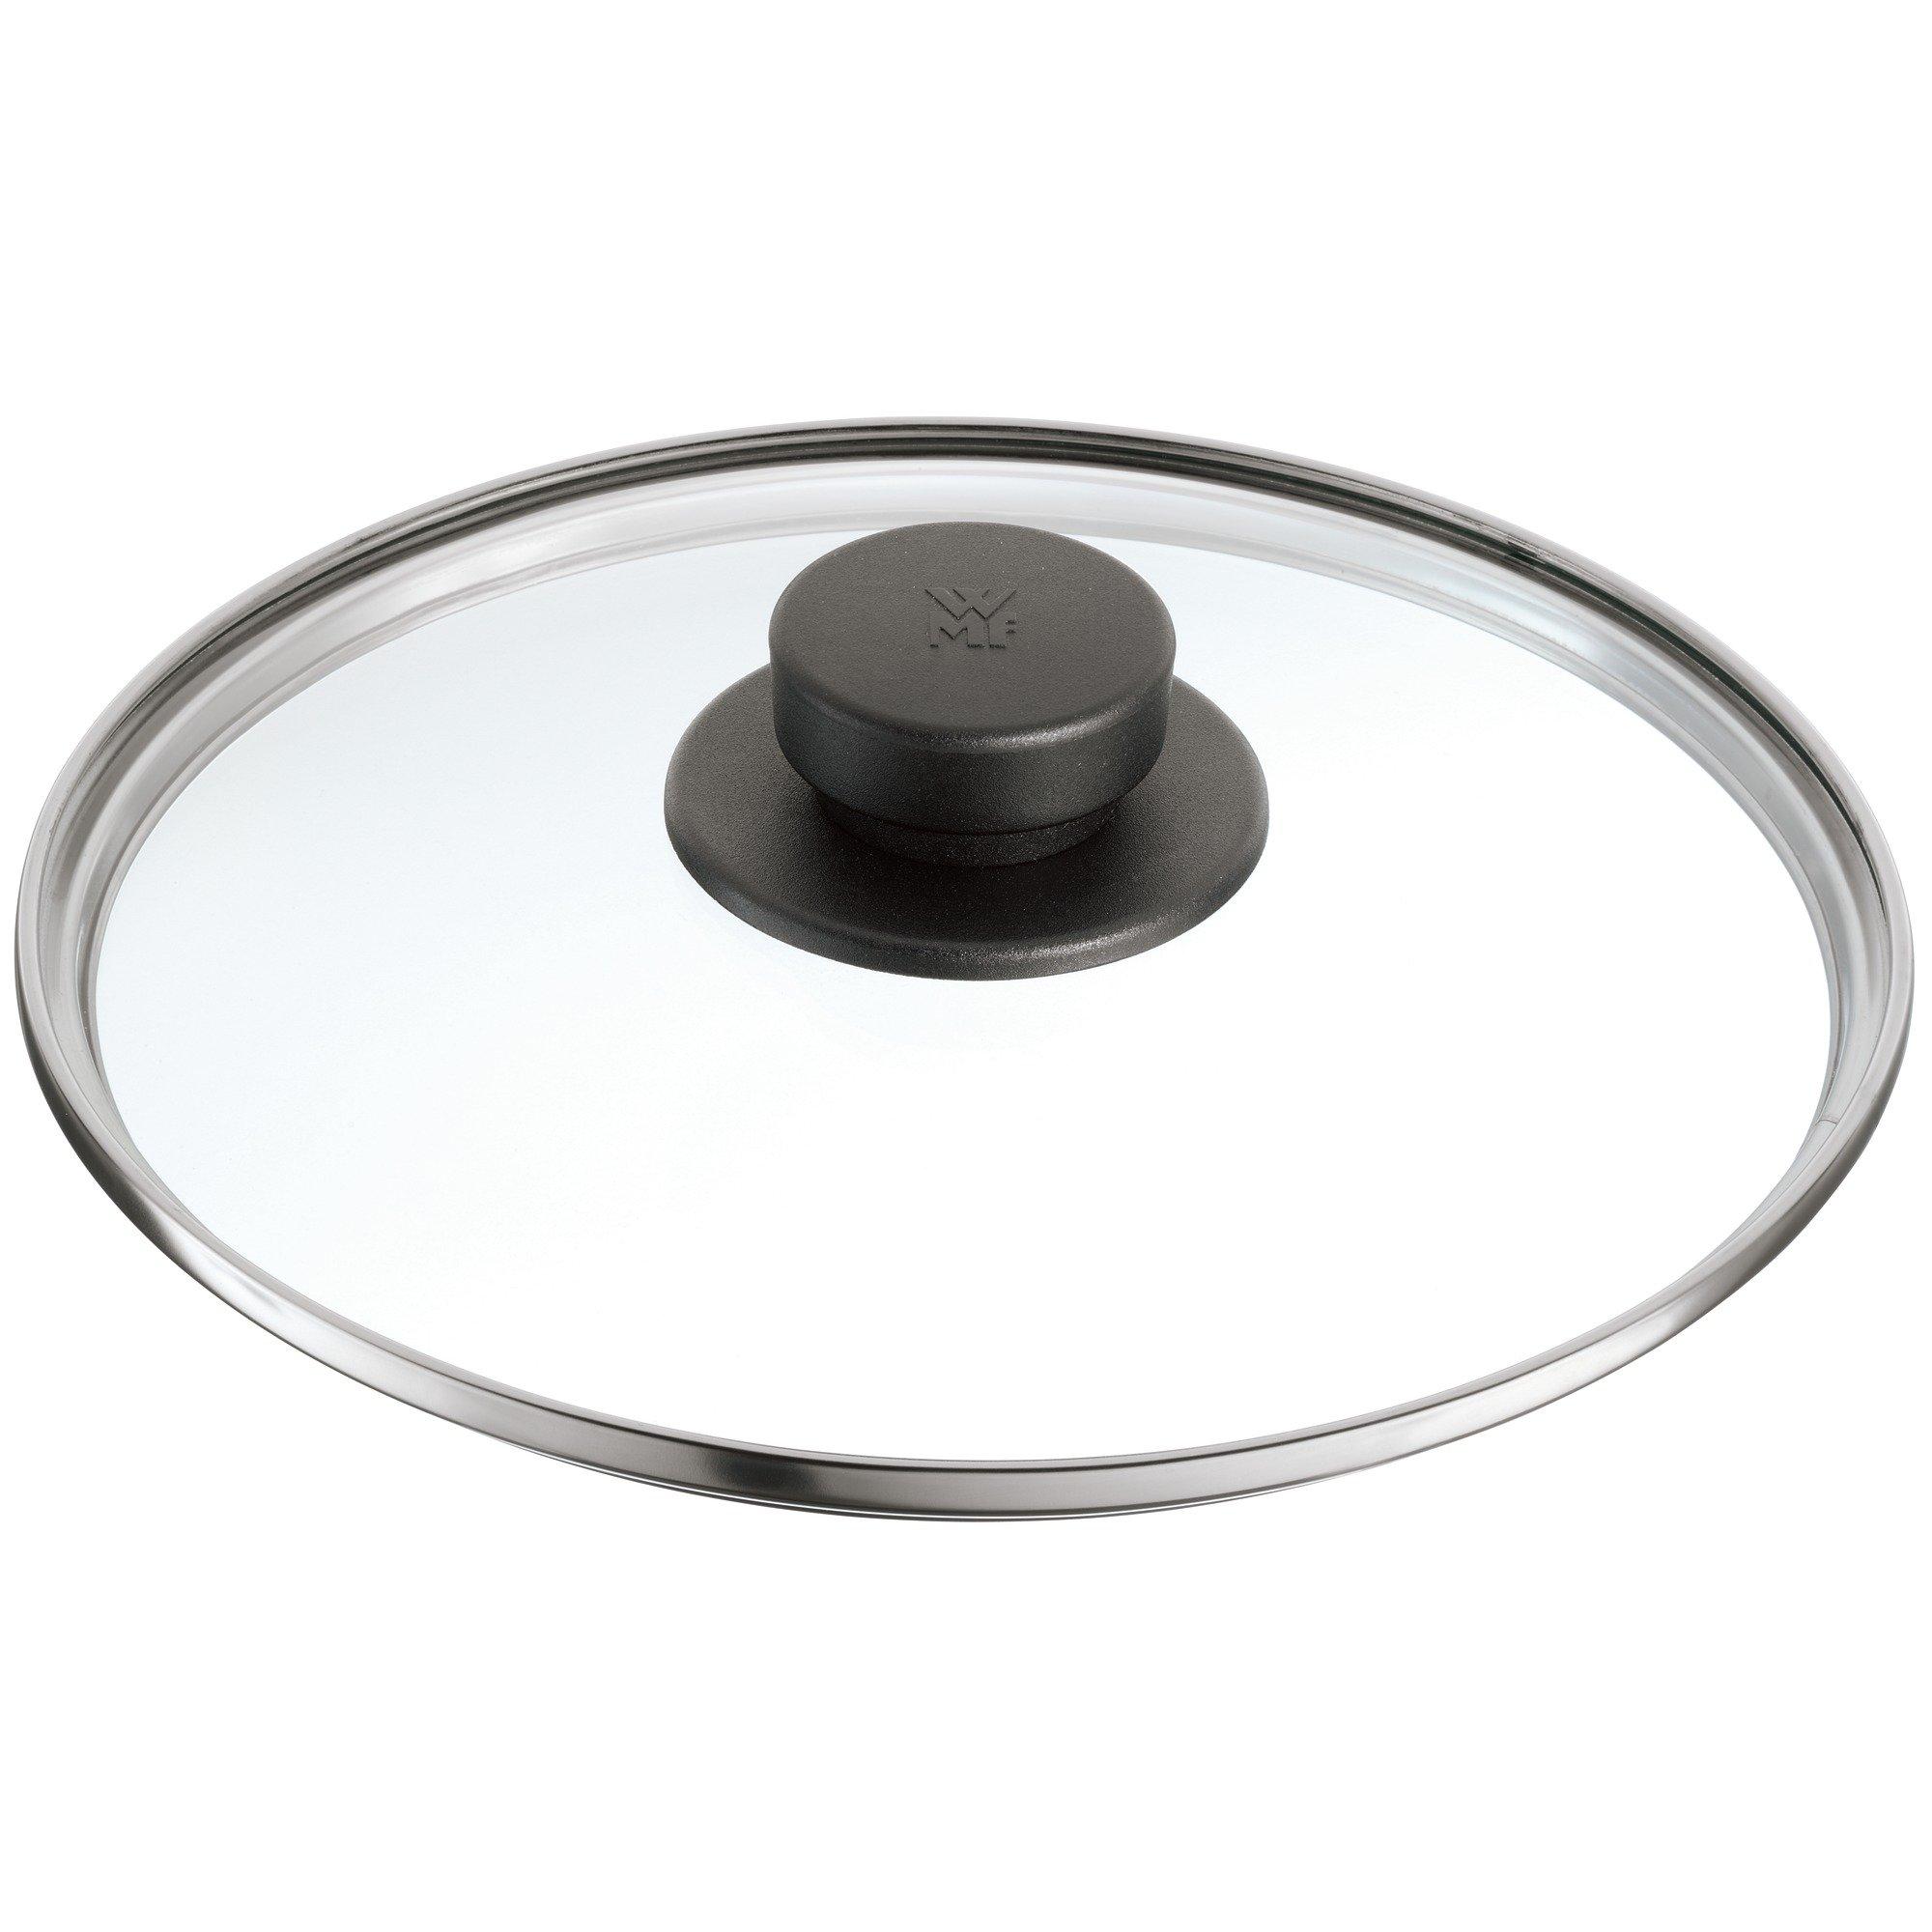 WMF Plus, Pro Tapa de Cristal con pomo sintético, Negro, 22 cm product